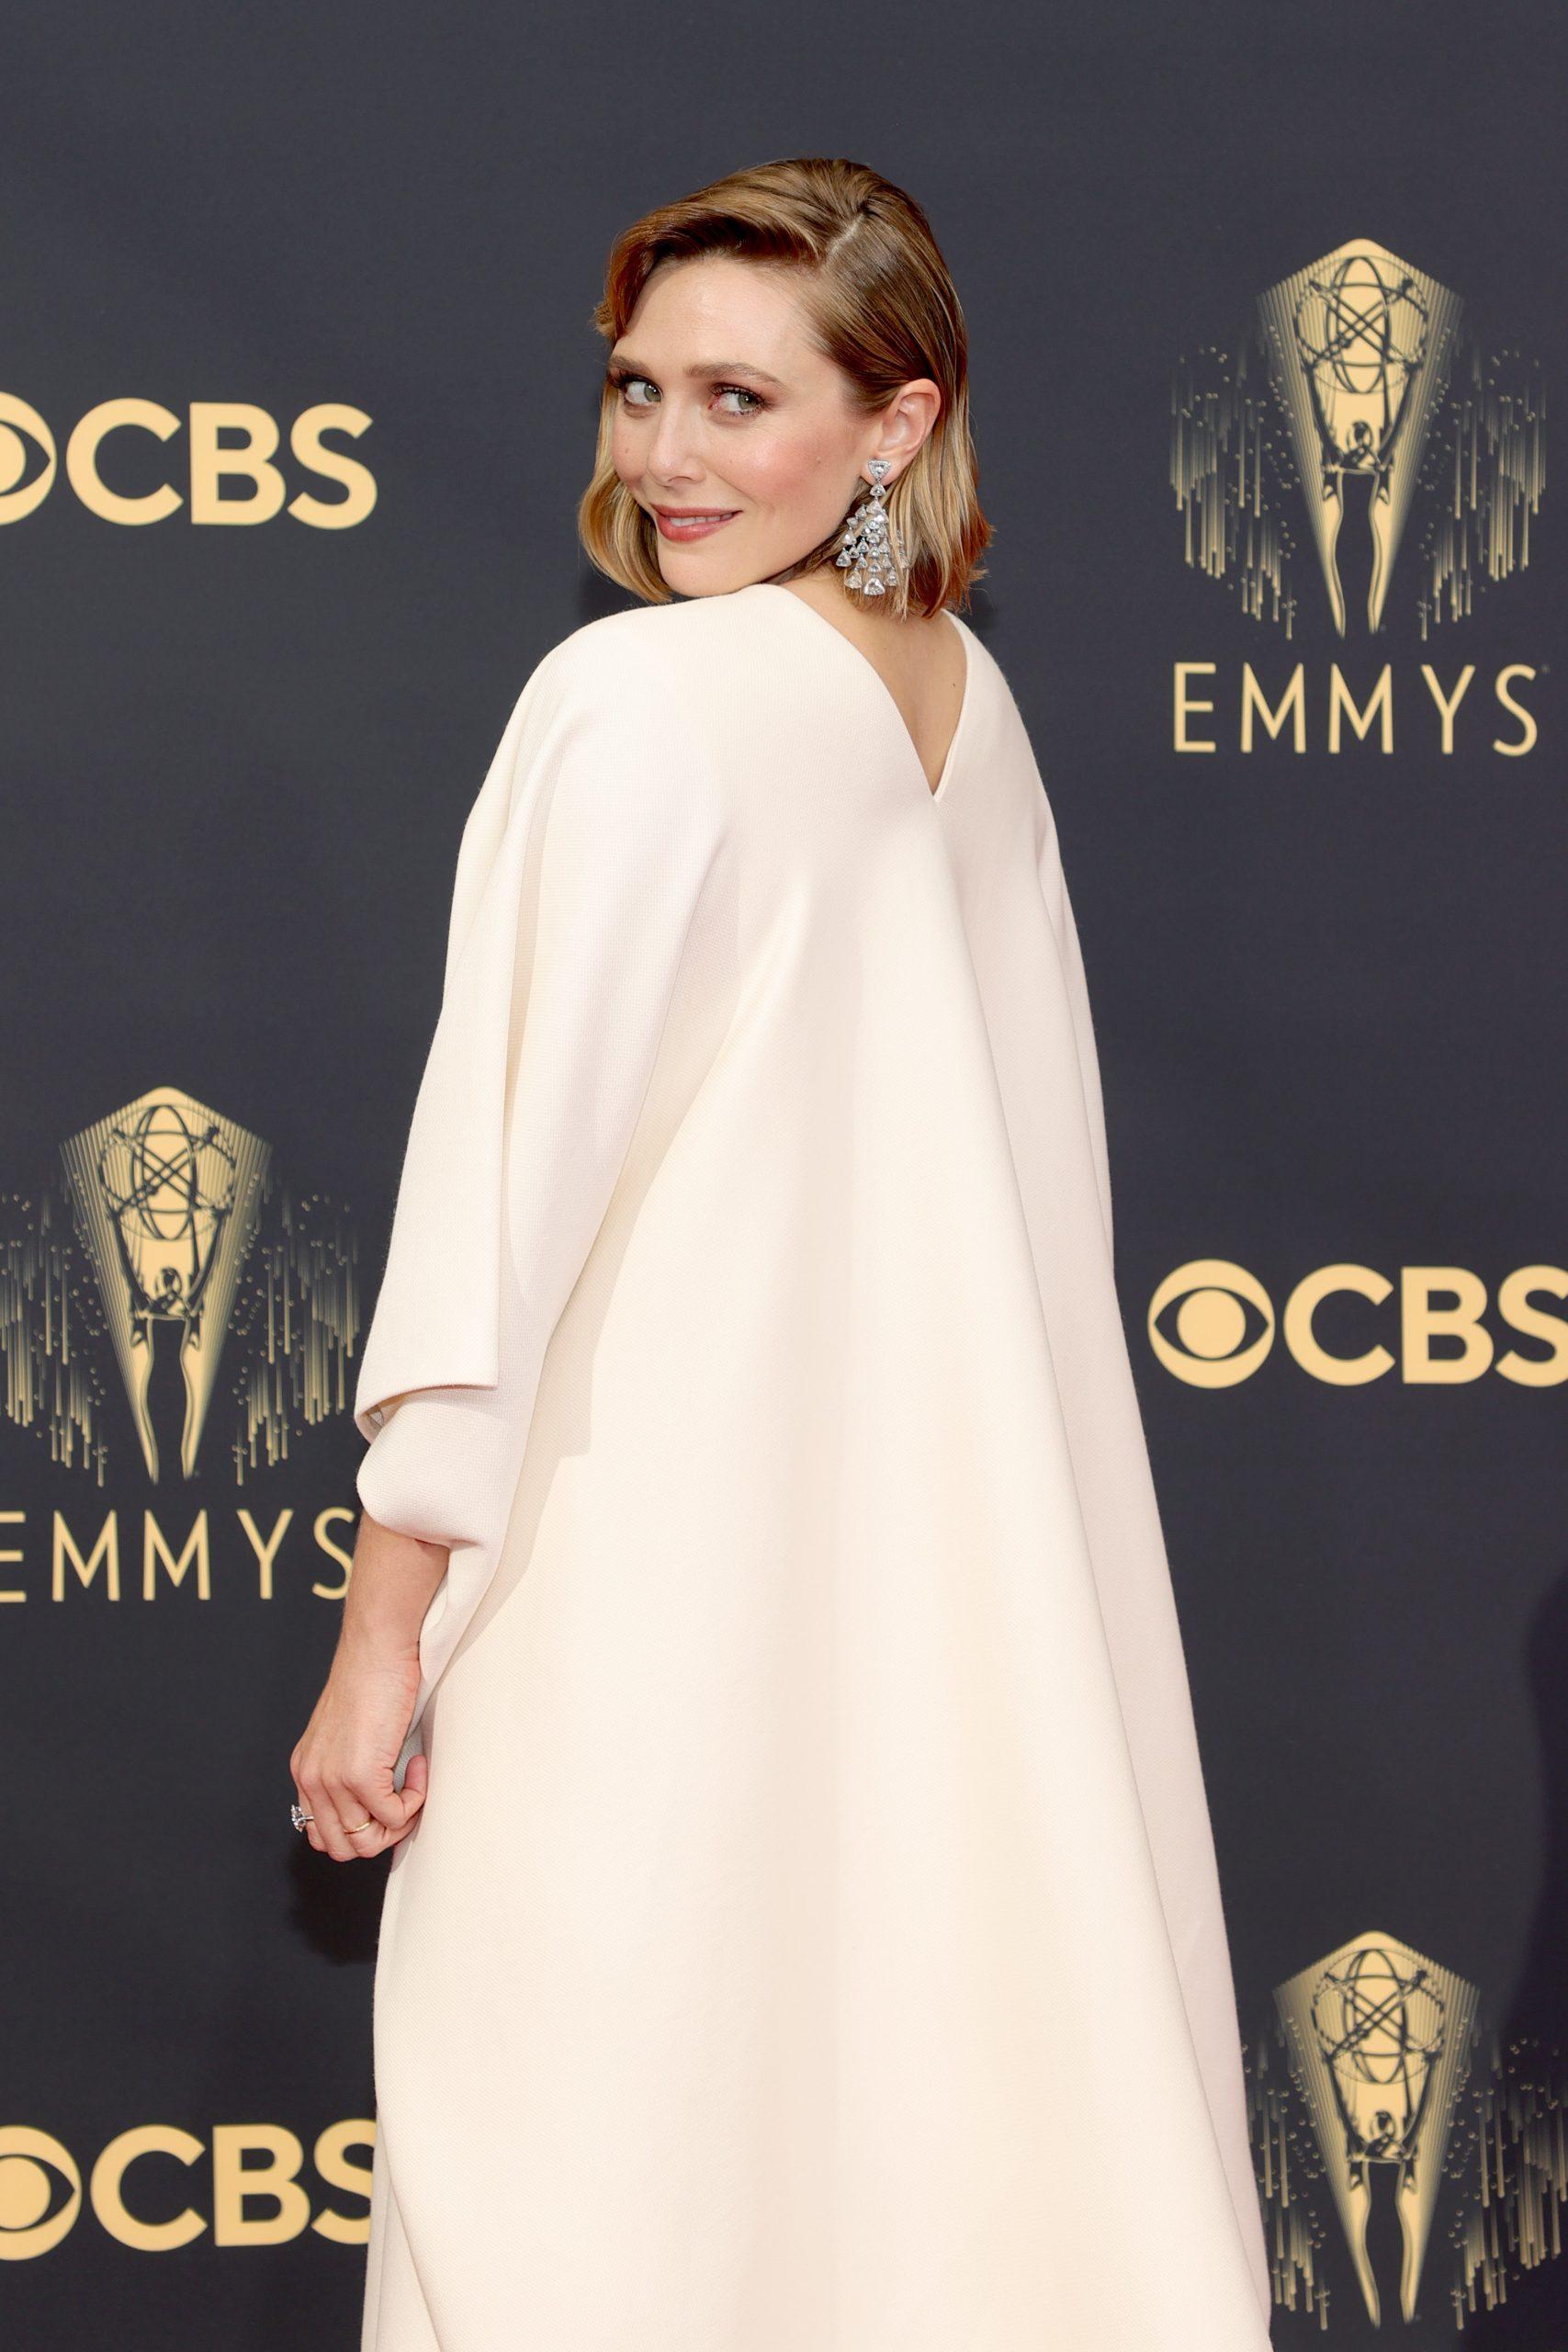 Emmy-nominated actor Elizabeth Olsen wearing The Row, Mary-Kate and Ashley Olsen's clothing line.